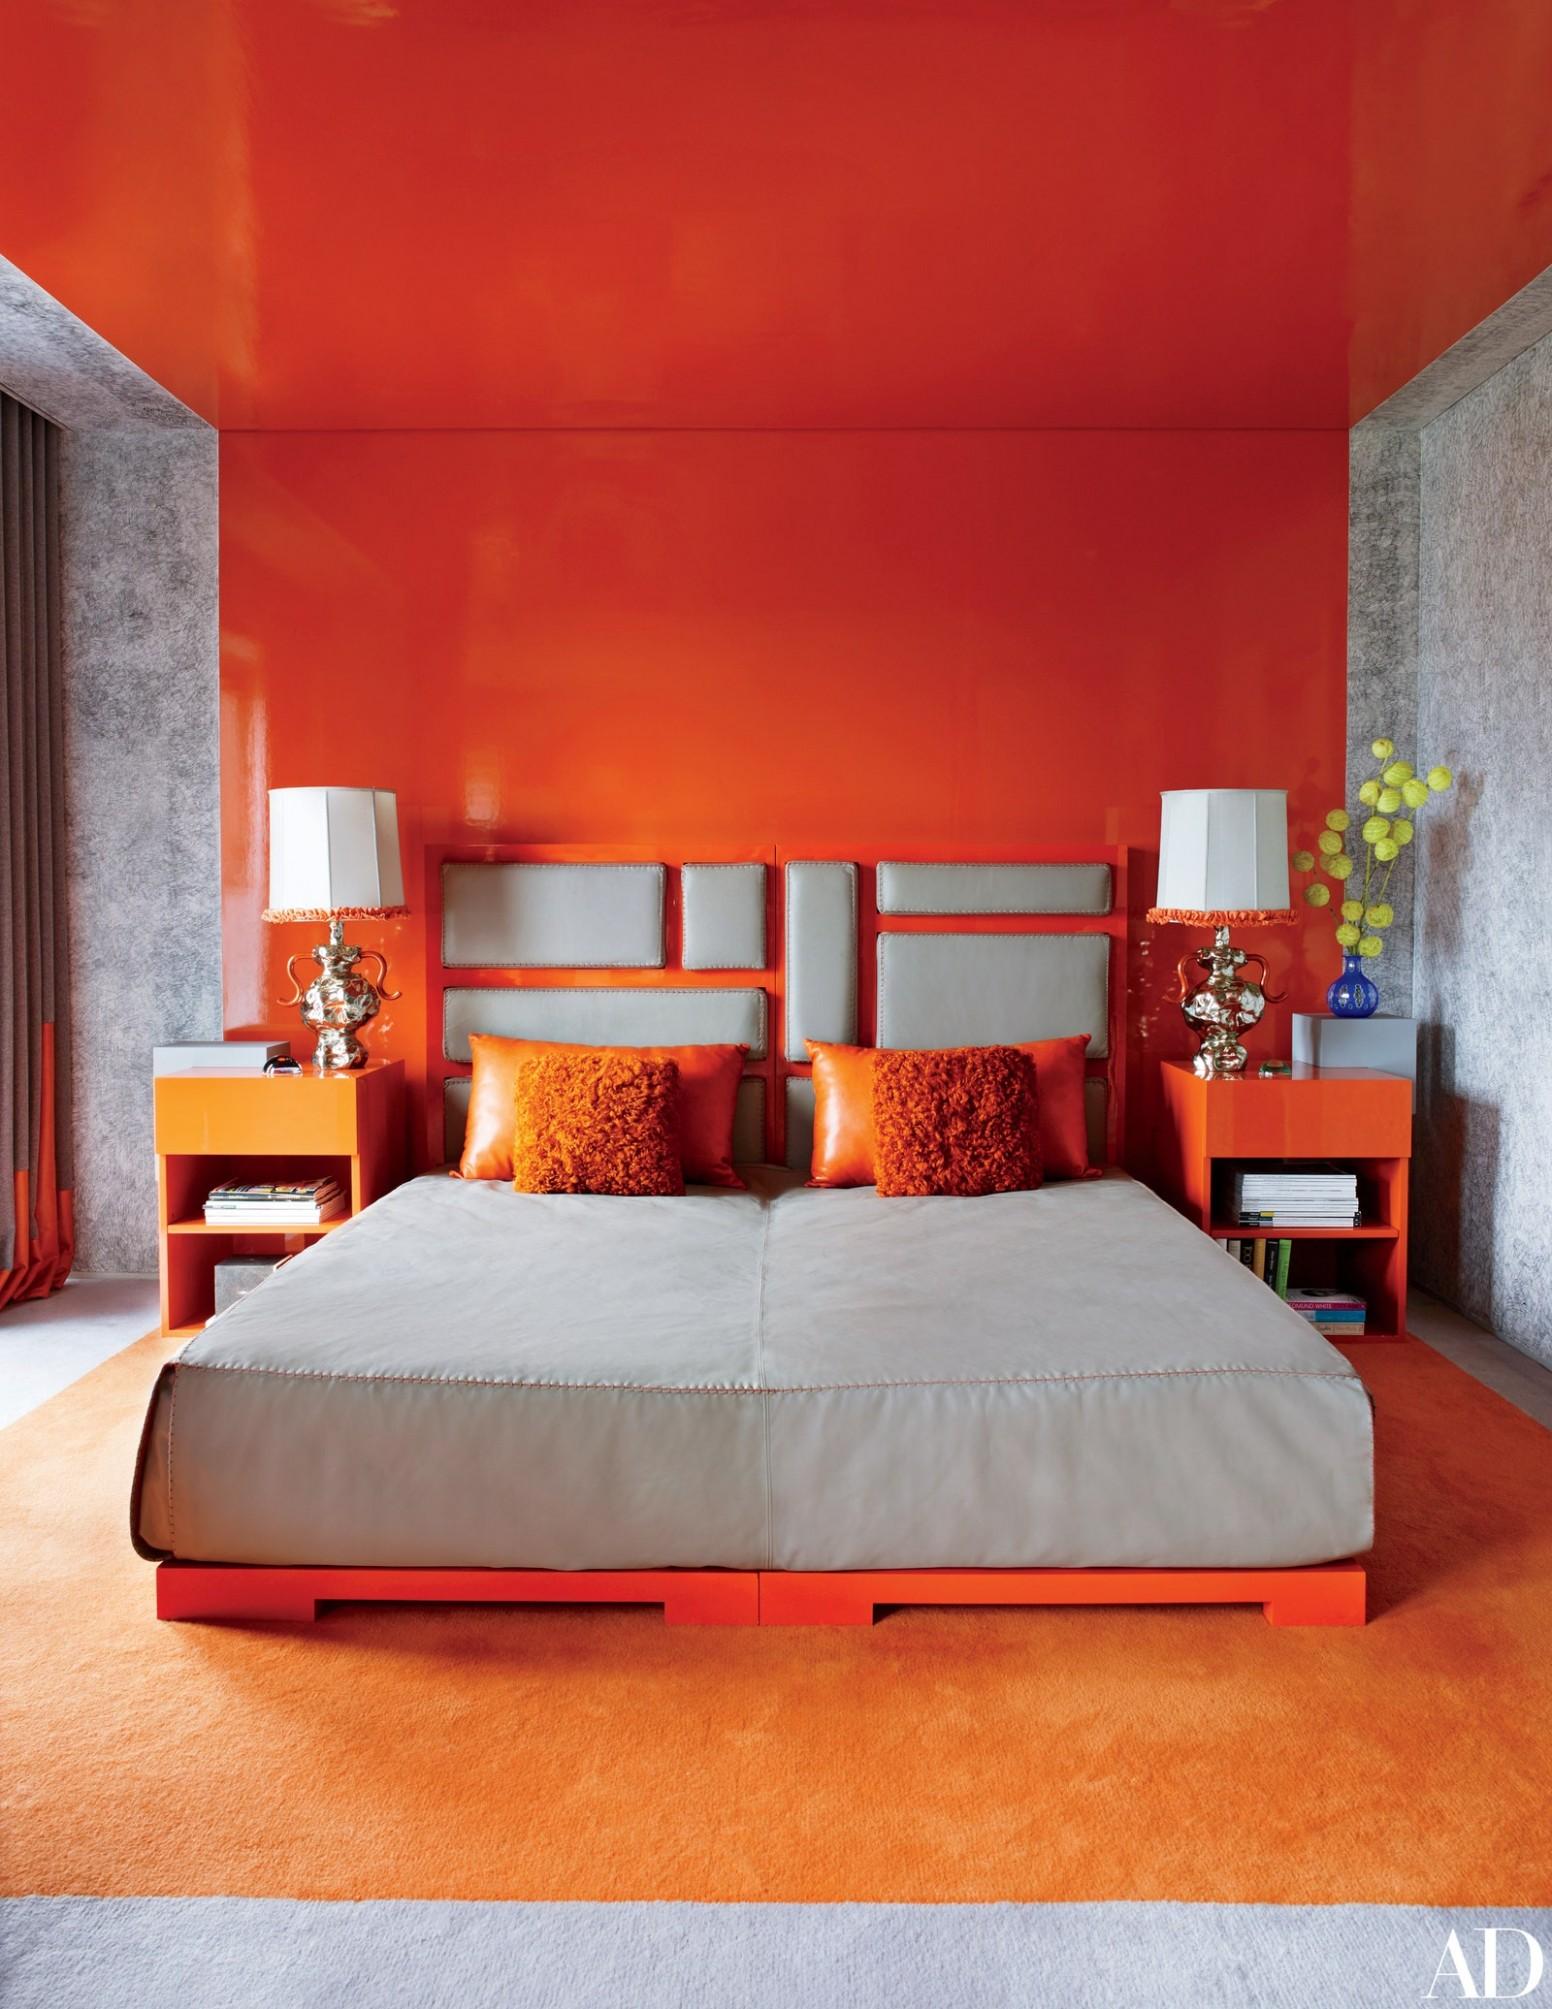 11 Master Bedroom Decorating Ideas and Design Inspiration  - Bedroom Ideas Orange